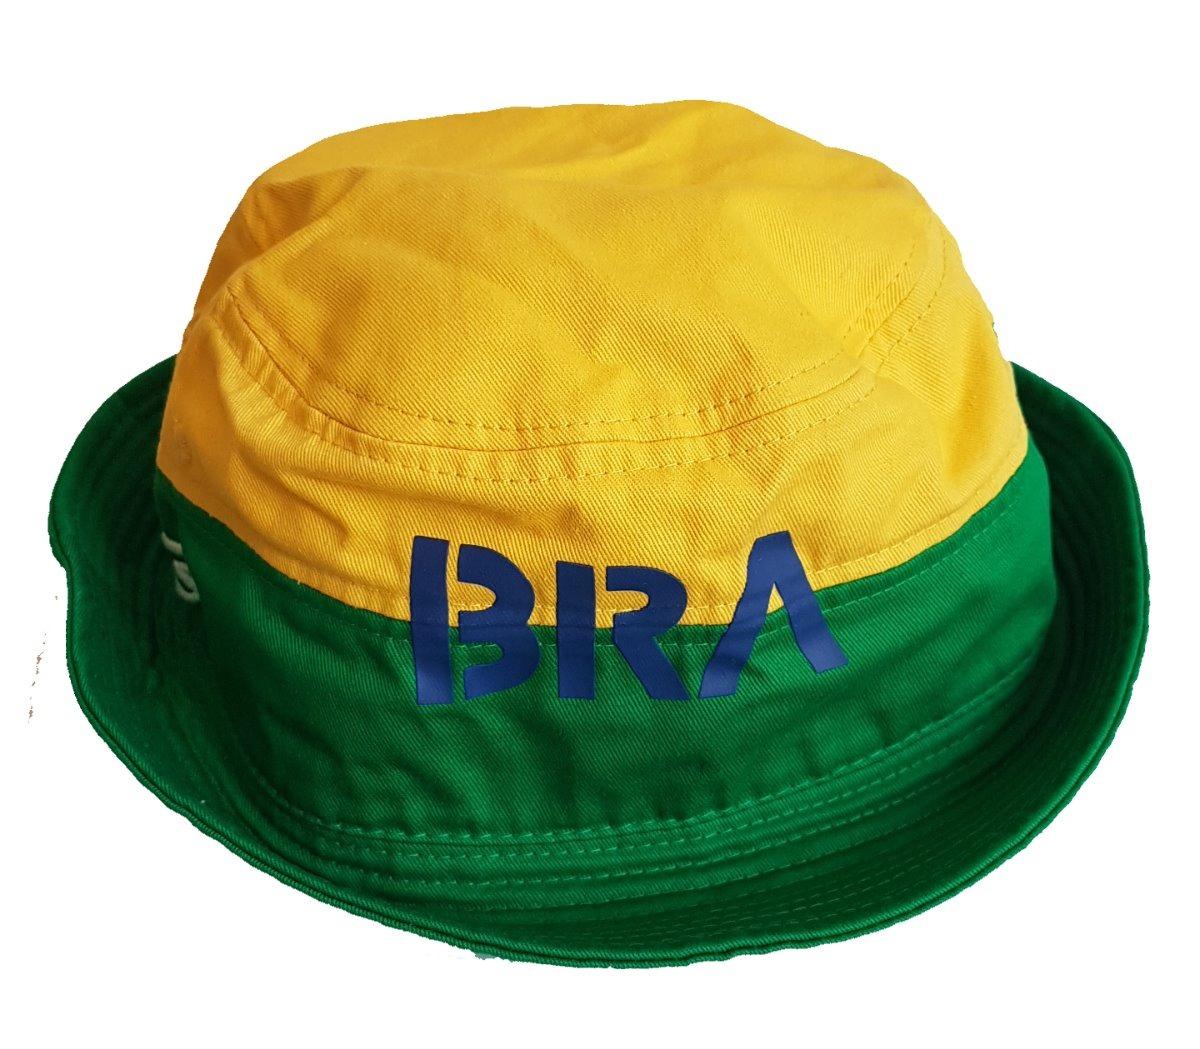 b97187ec187 chapéu lacoste sport brasil. Carregando zoom.